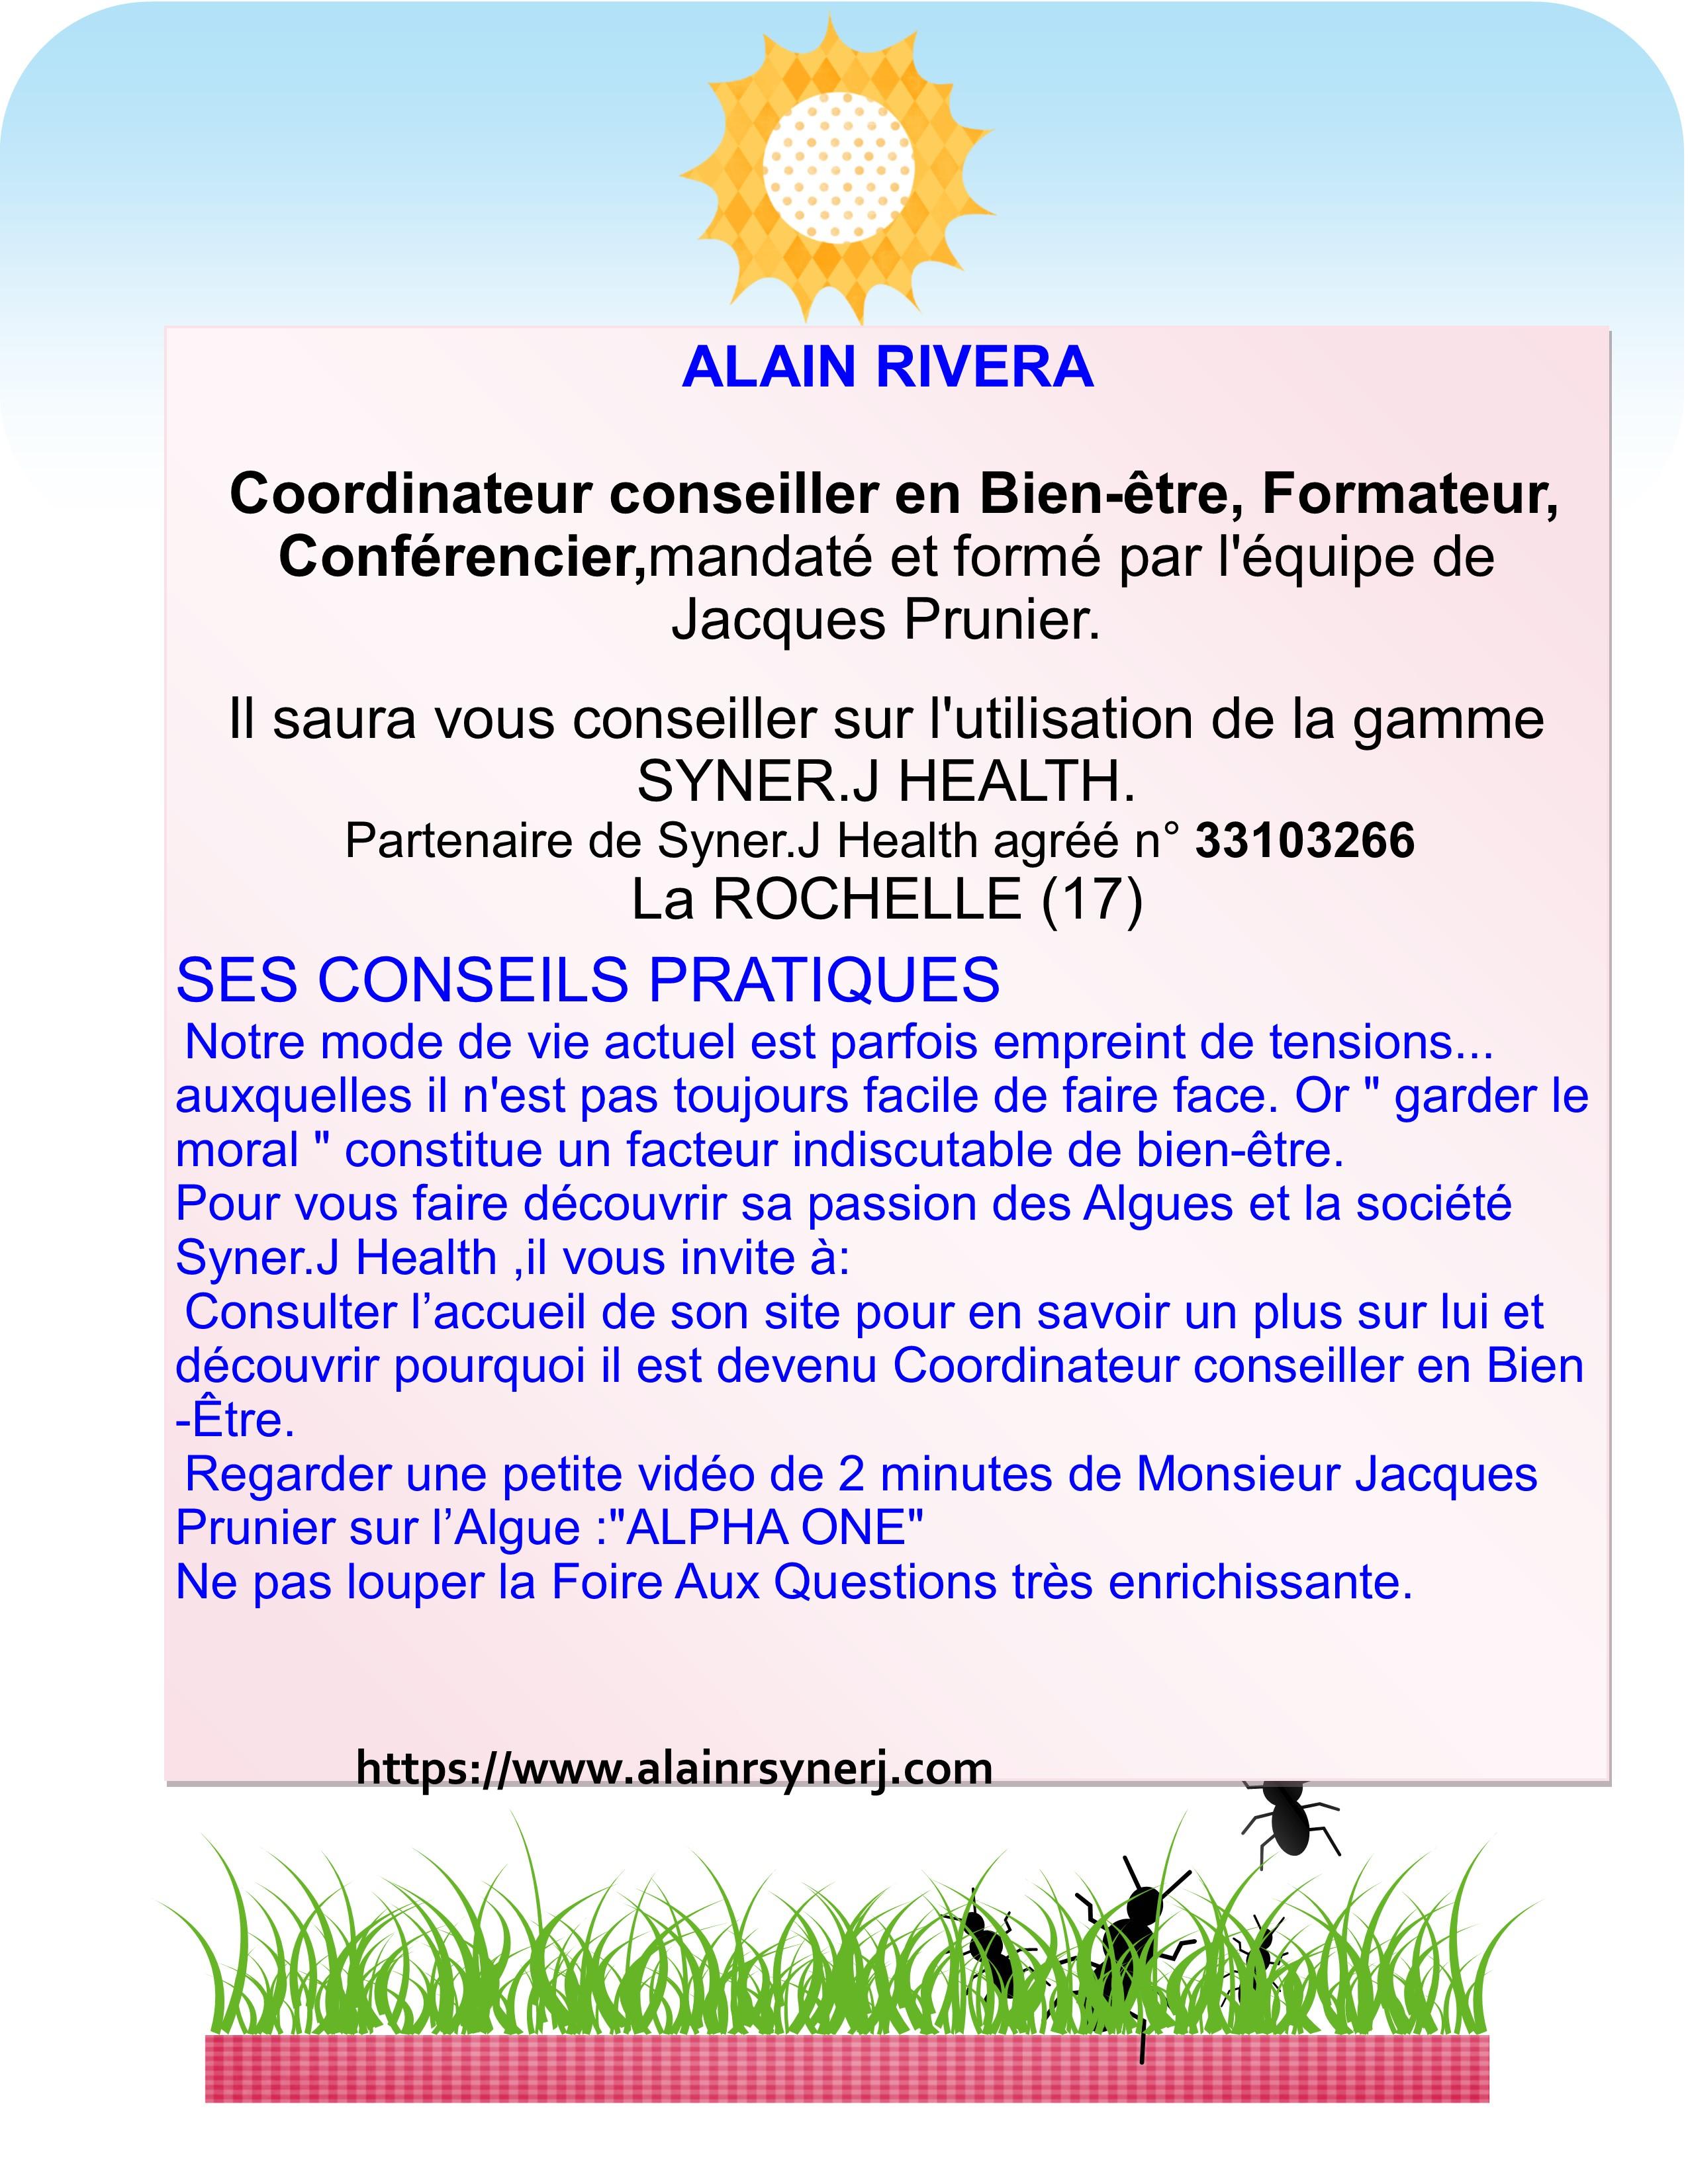 Alain Rivera